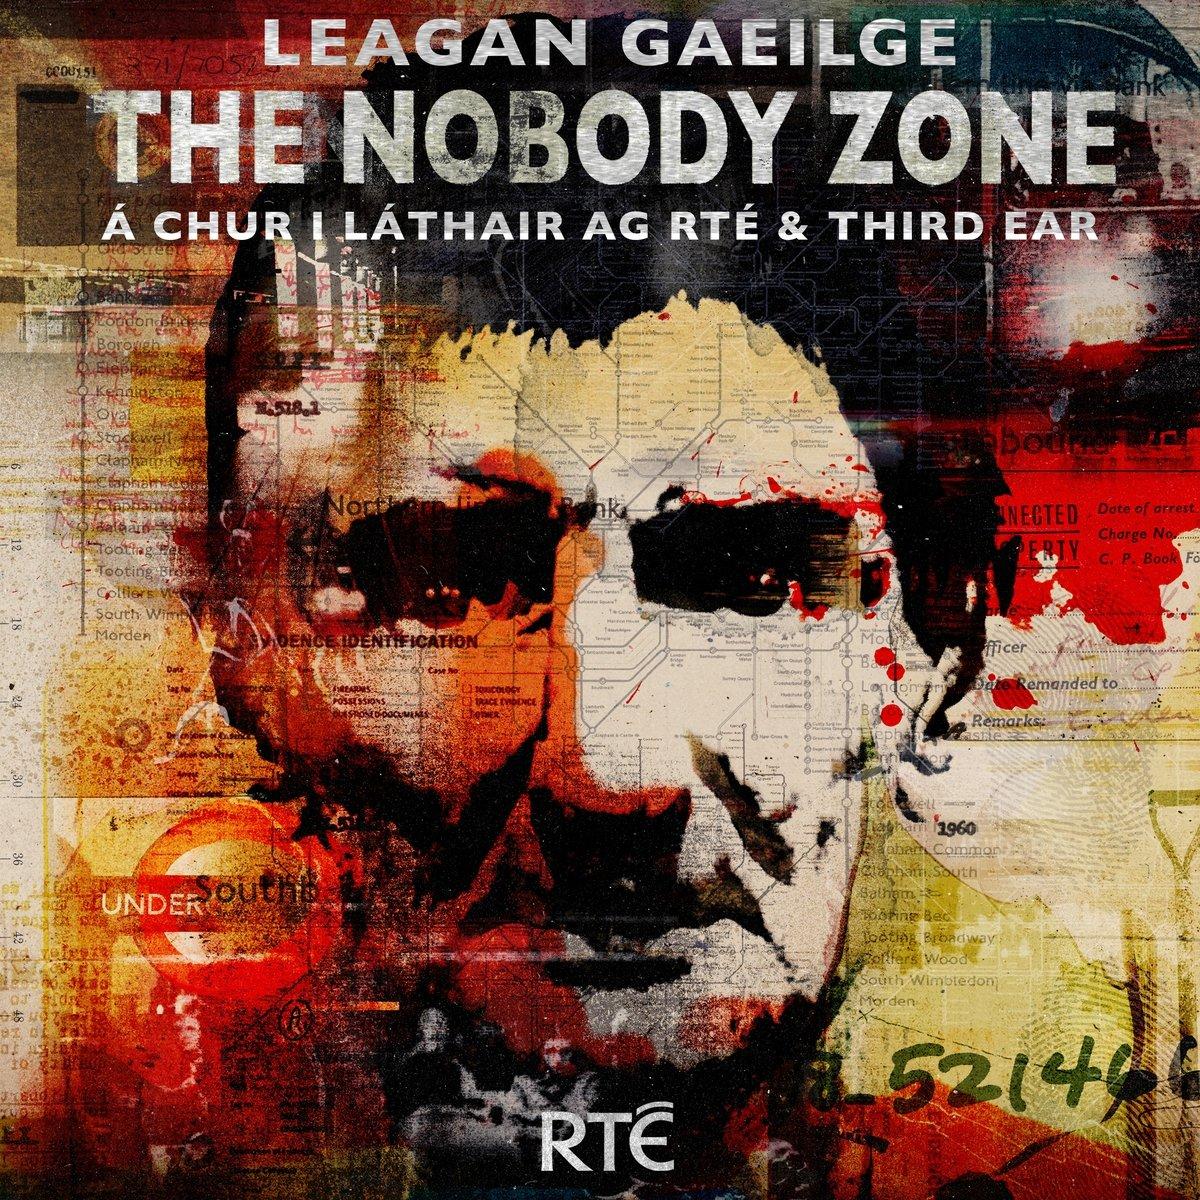 Leagan Gaeilge: The Nobody Zone